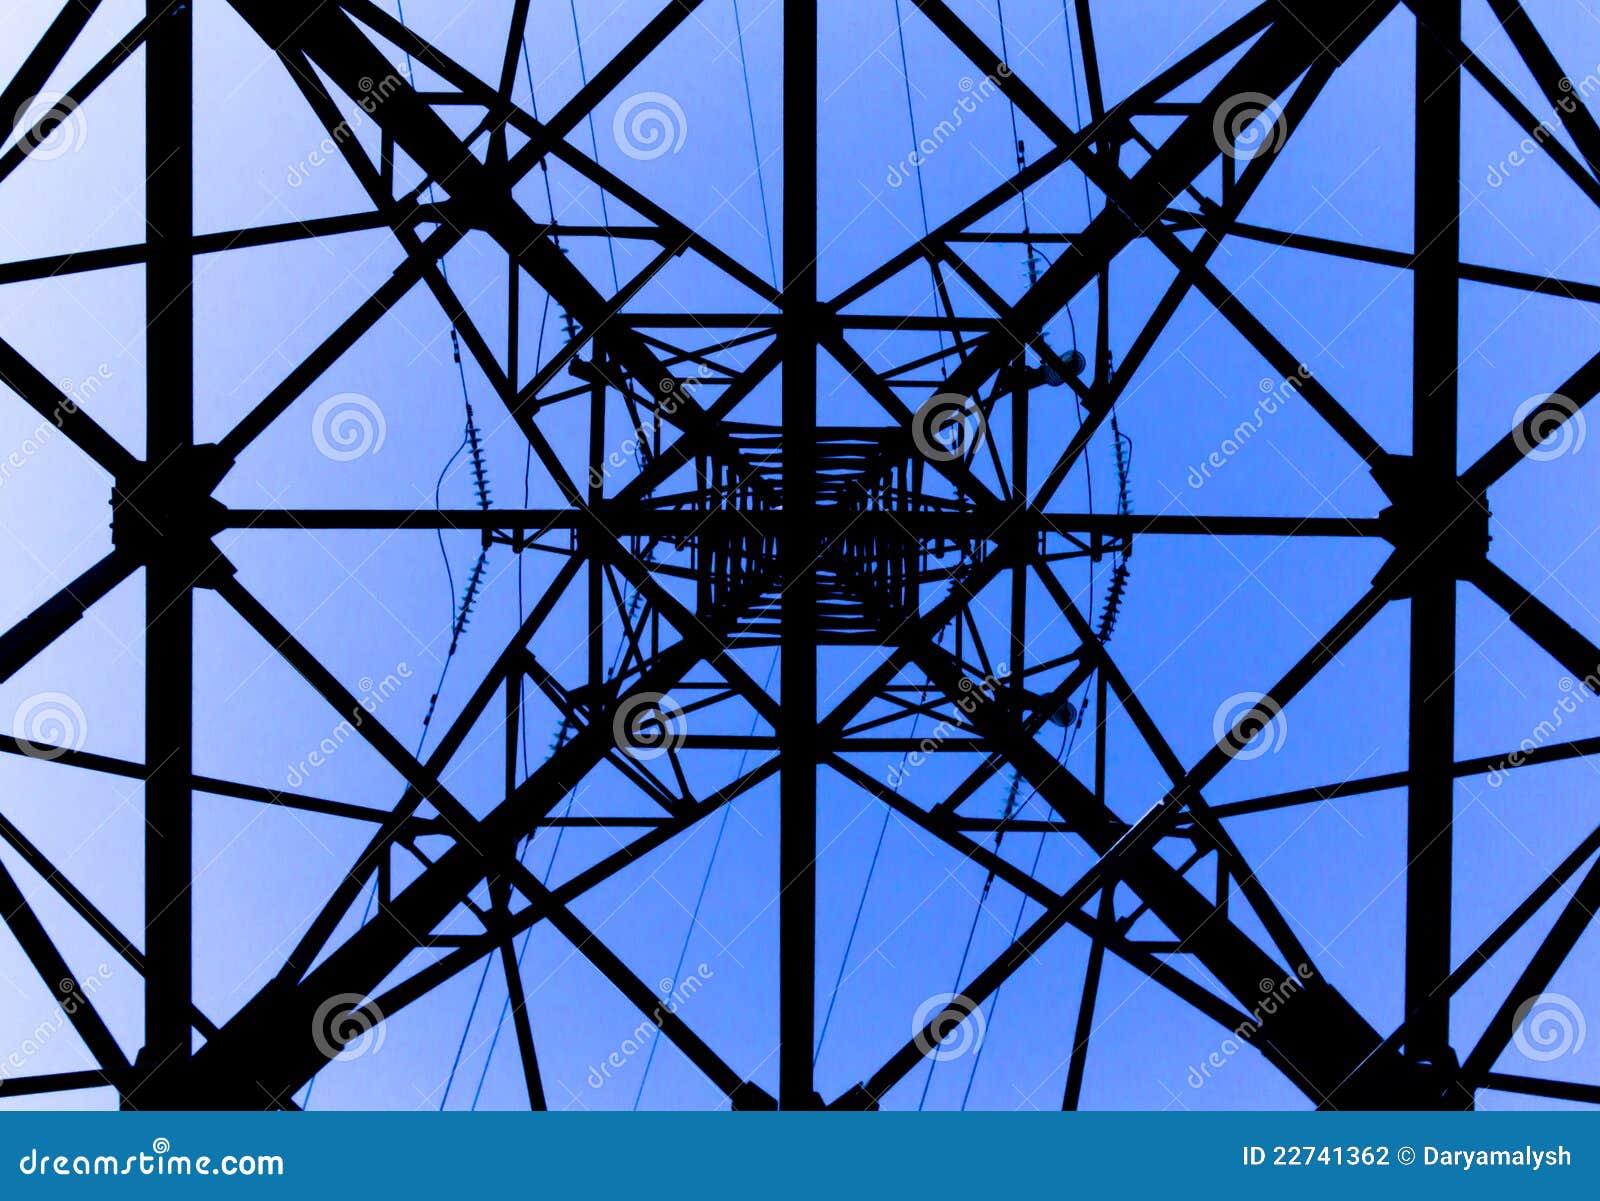 High-voltage Line Support